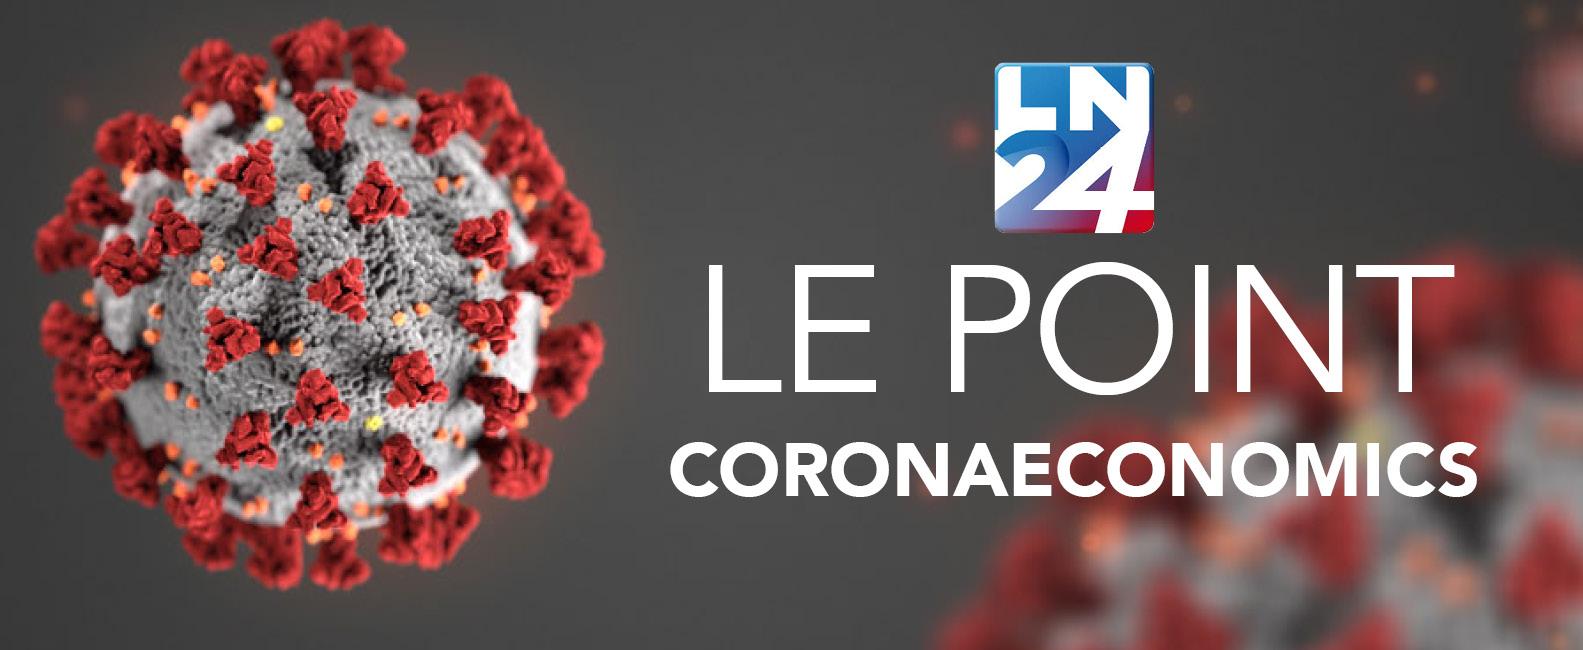 Coronaeconomics  -  Amid Faljaoui, sur LN24